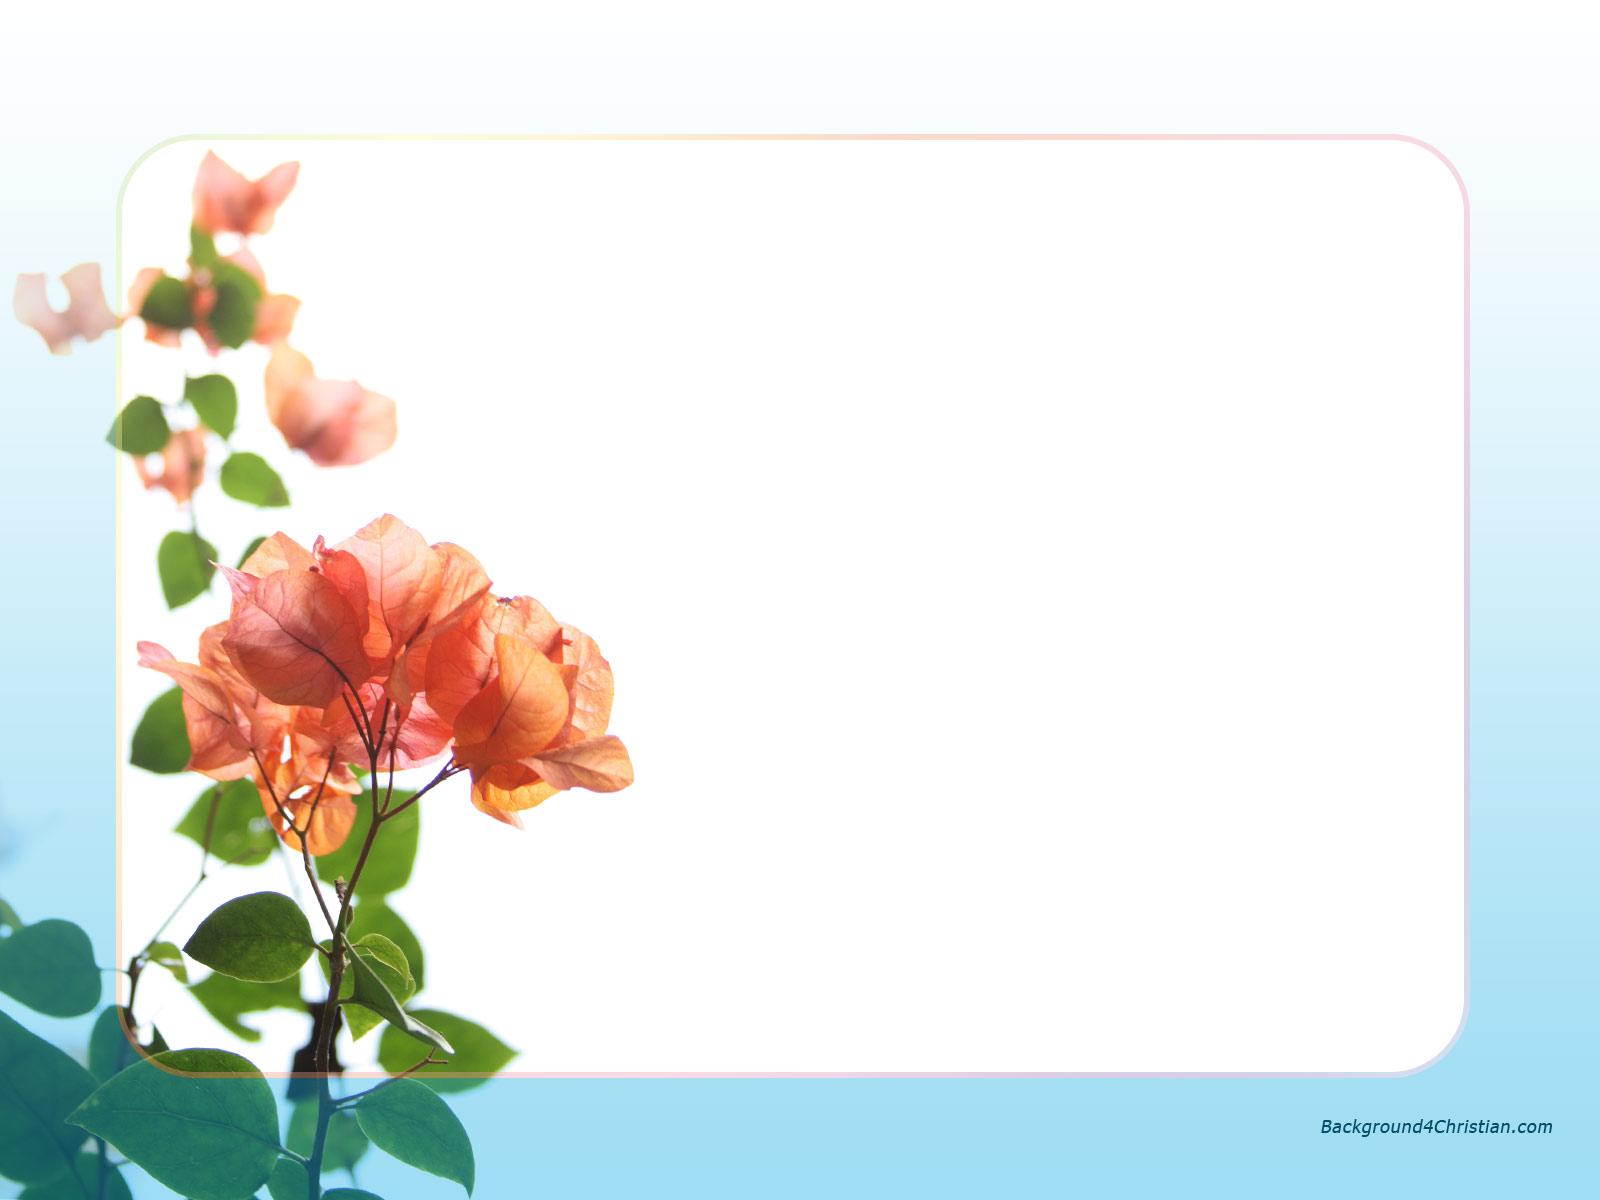 Free Wallpaper Stock: Wallpaper Borders